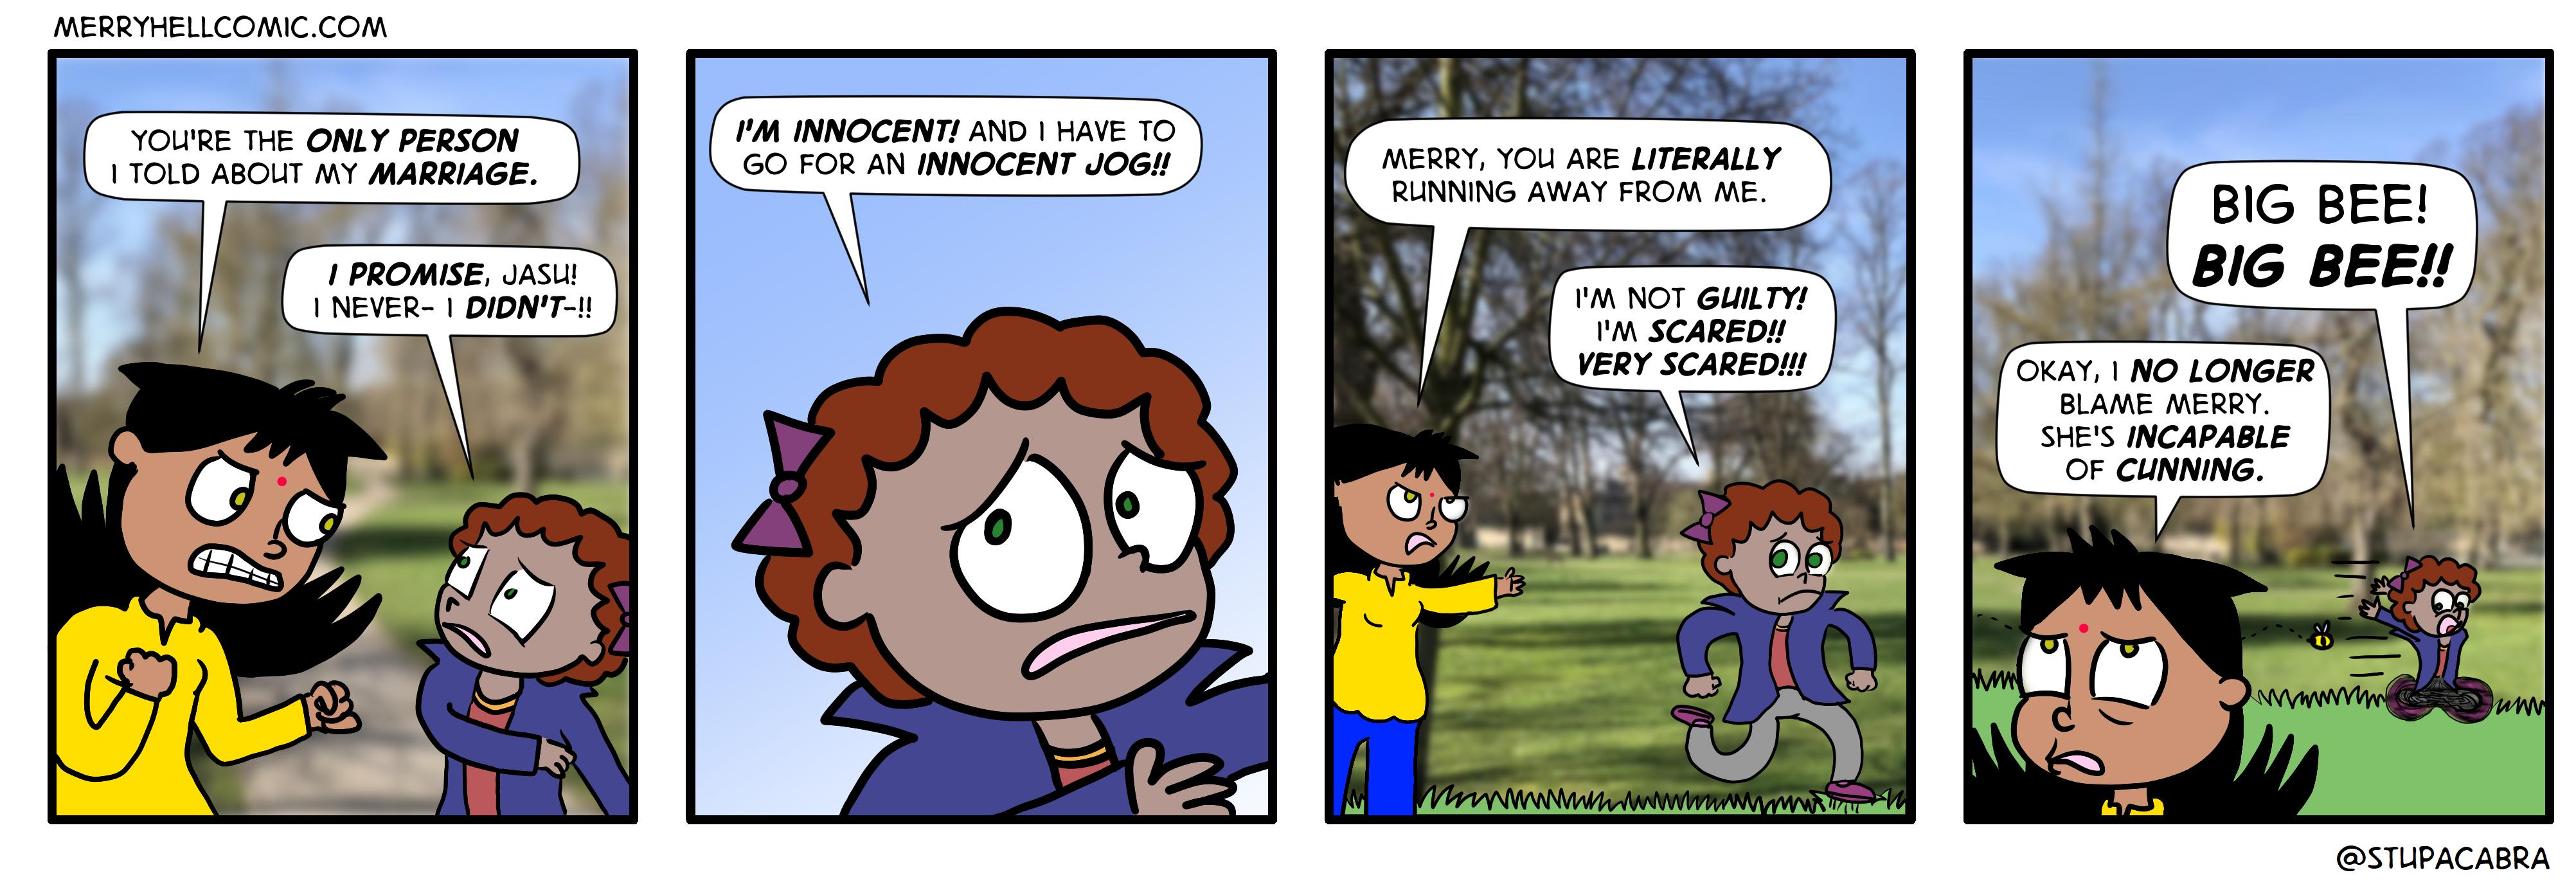 340. Innocent jog